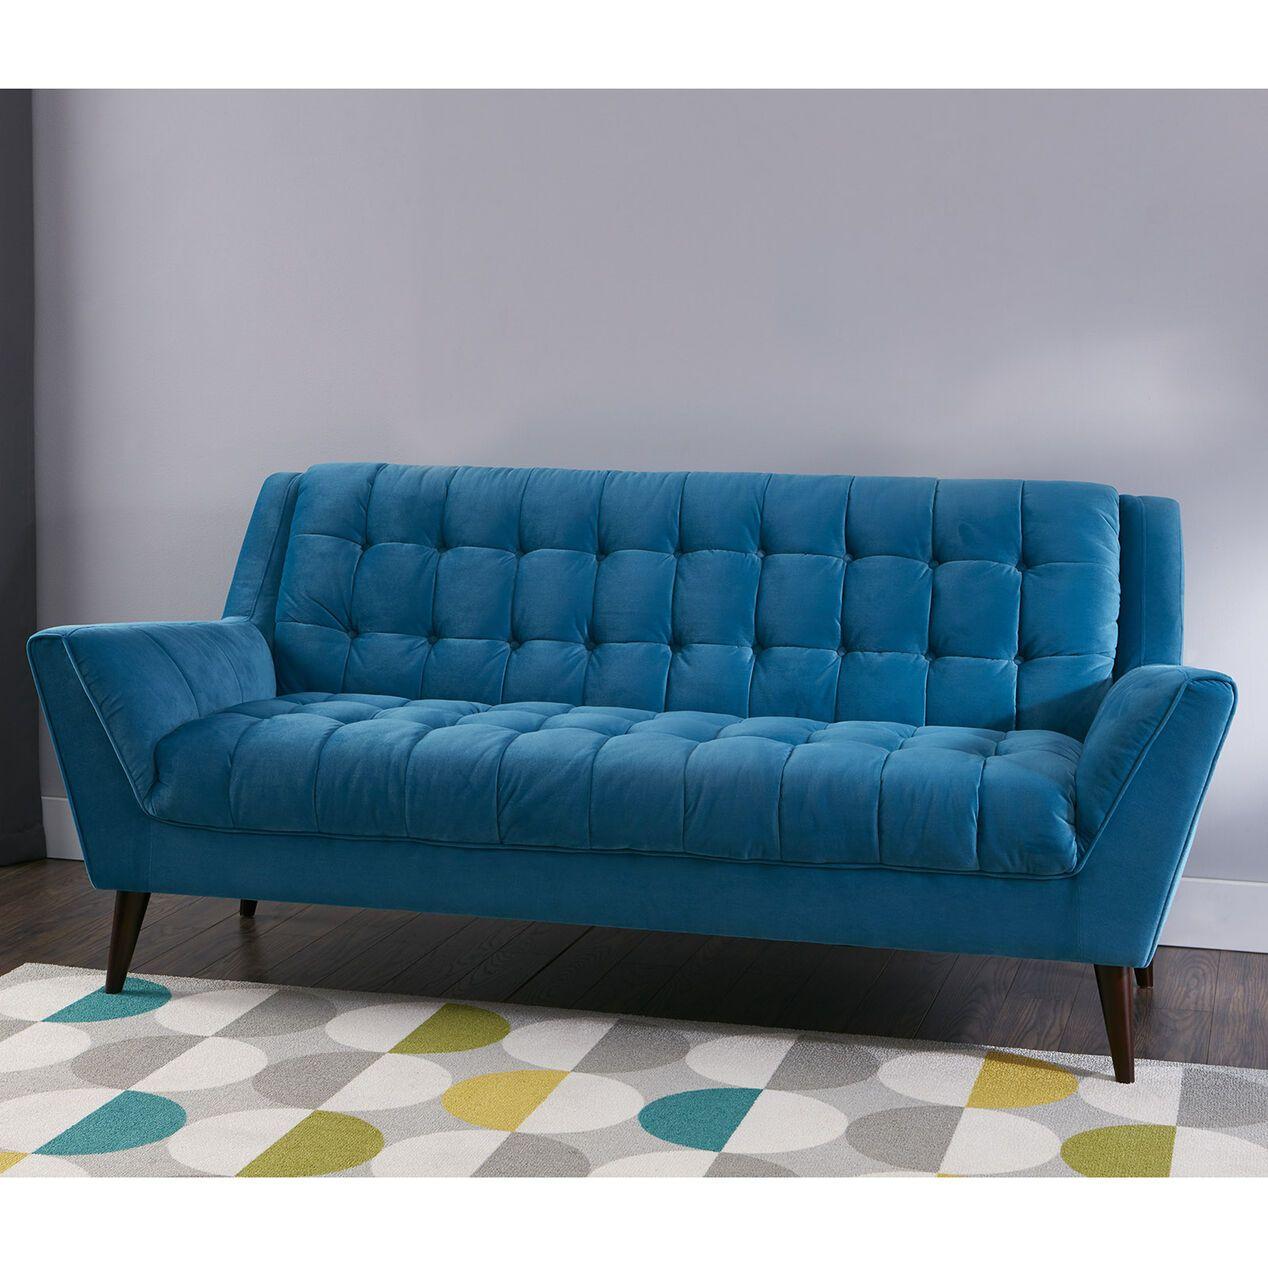 Braxton Mid Century Modern Retro Sofa